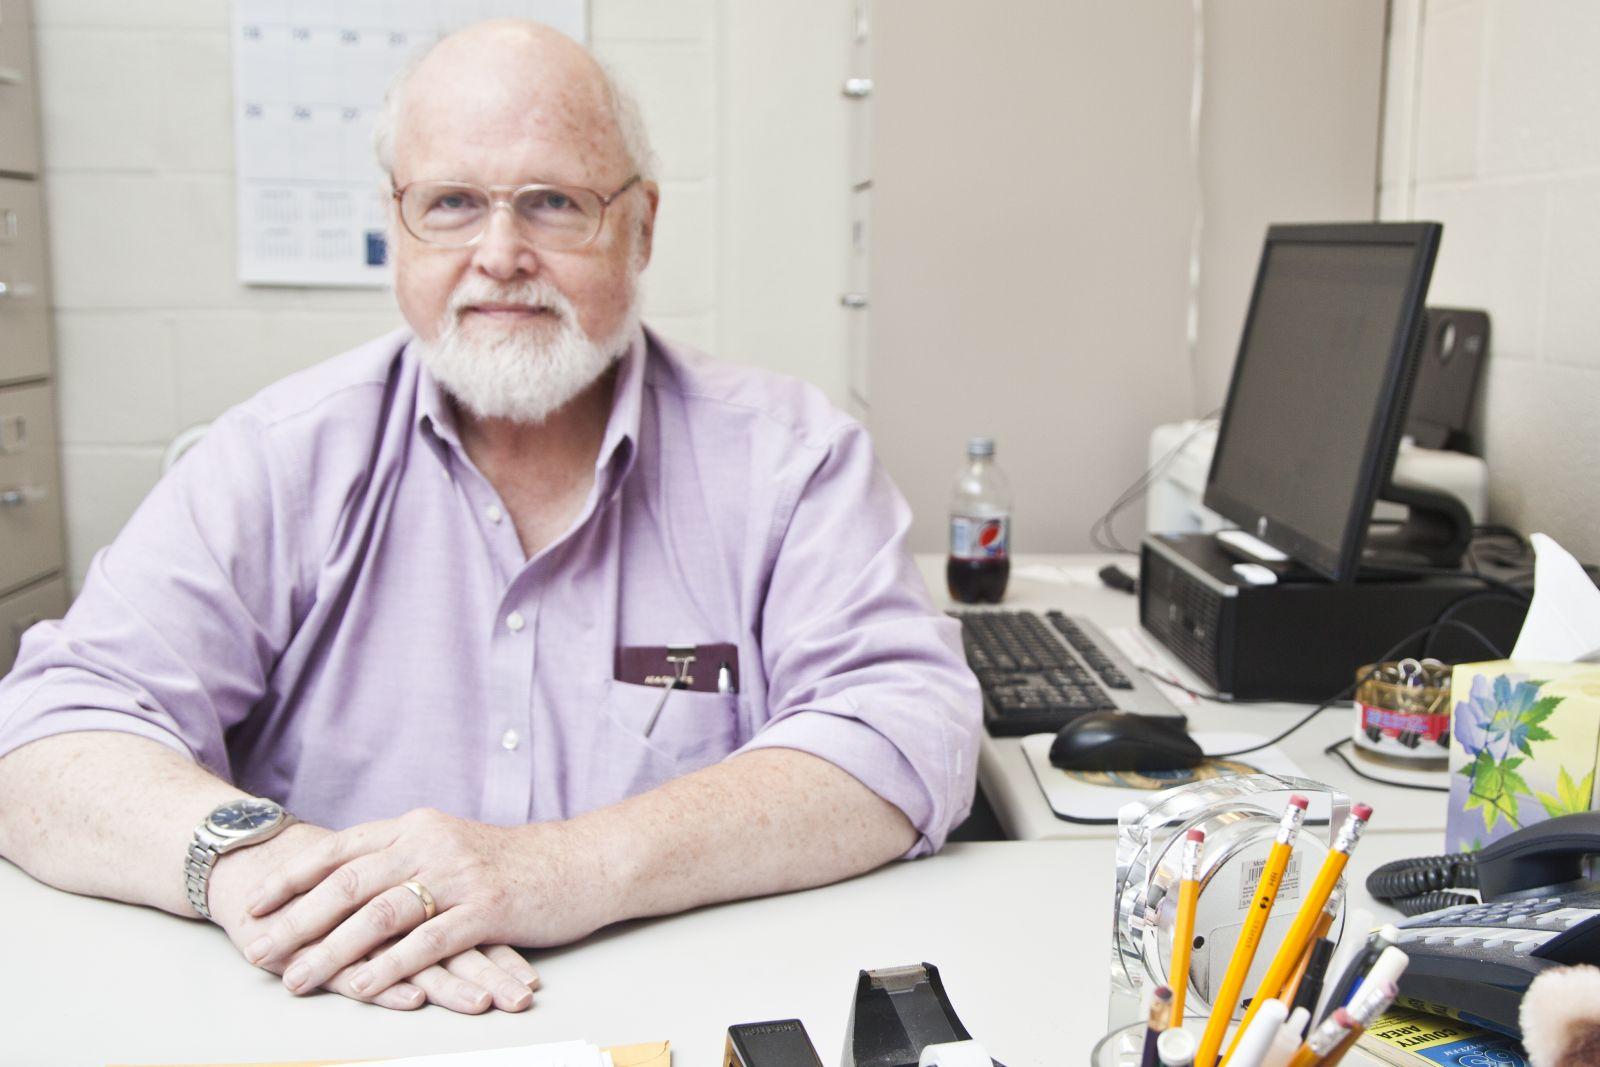 Dr. J. Justin Gustainis